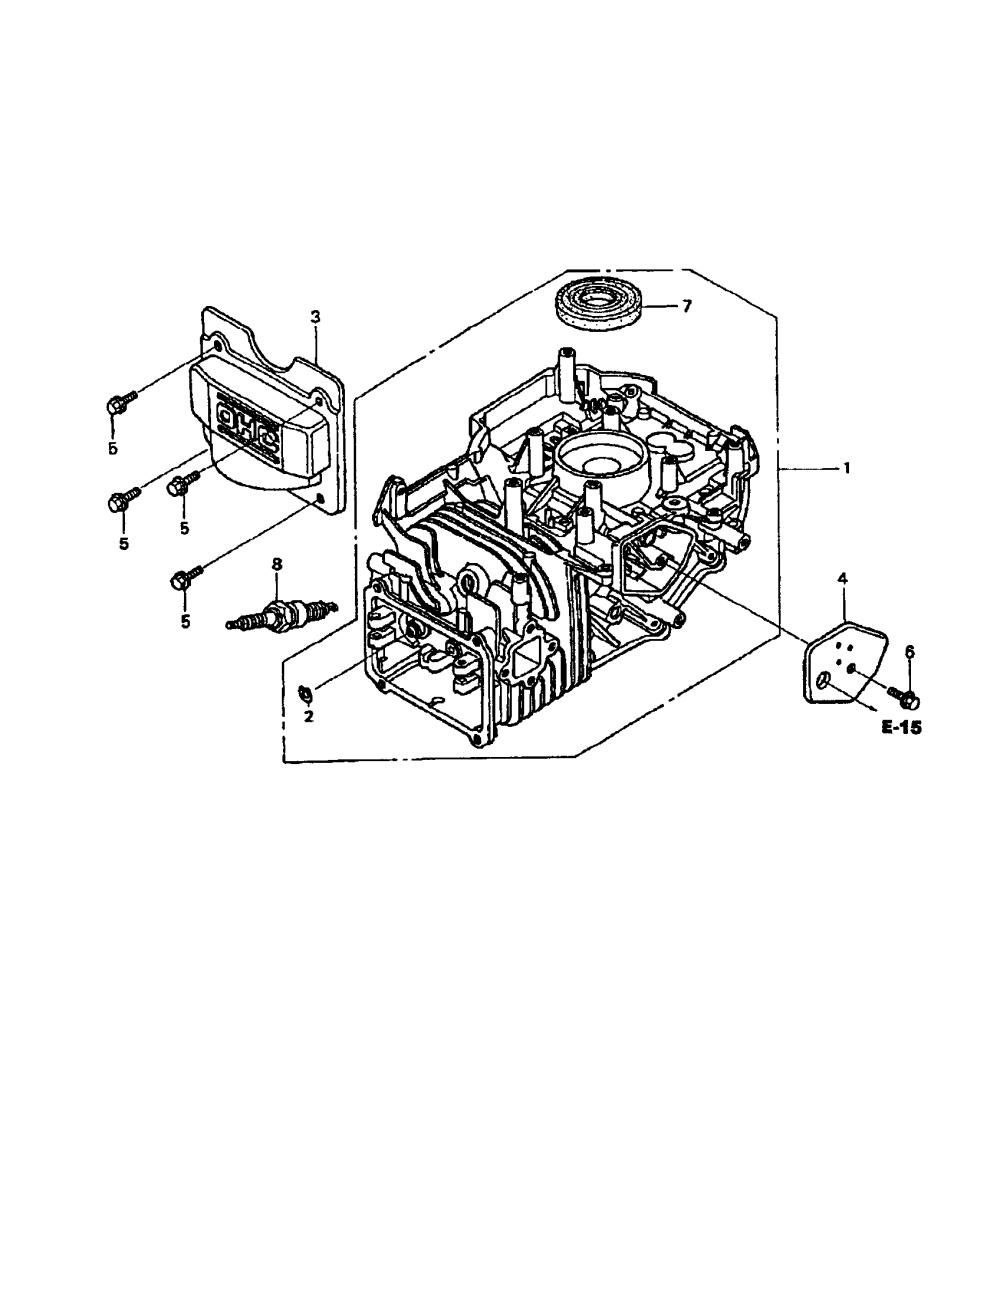 medium resolution of honda gcv 190 as3a cylinder barrel diagram